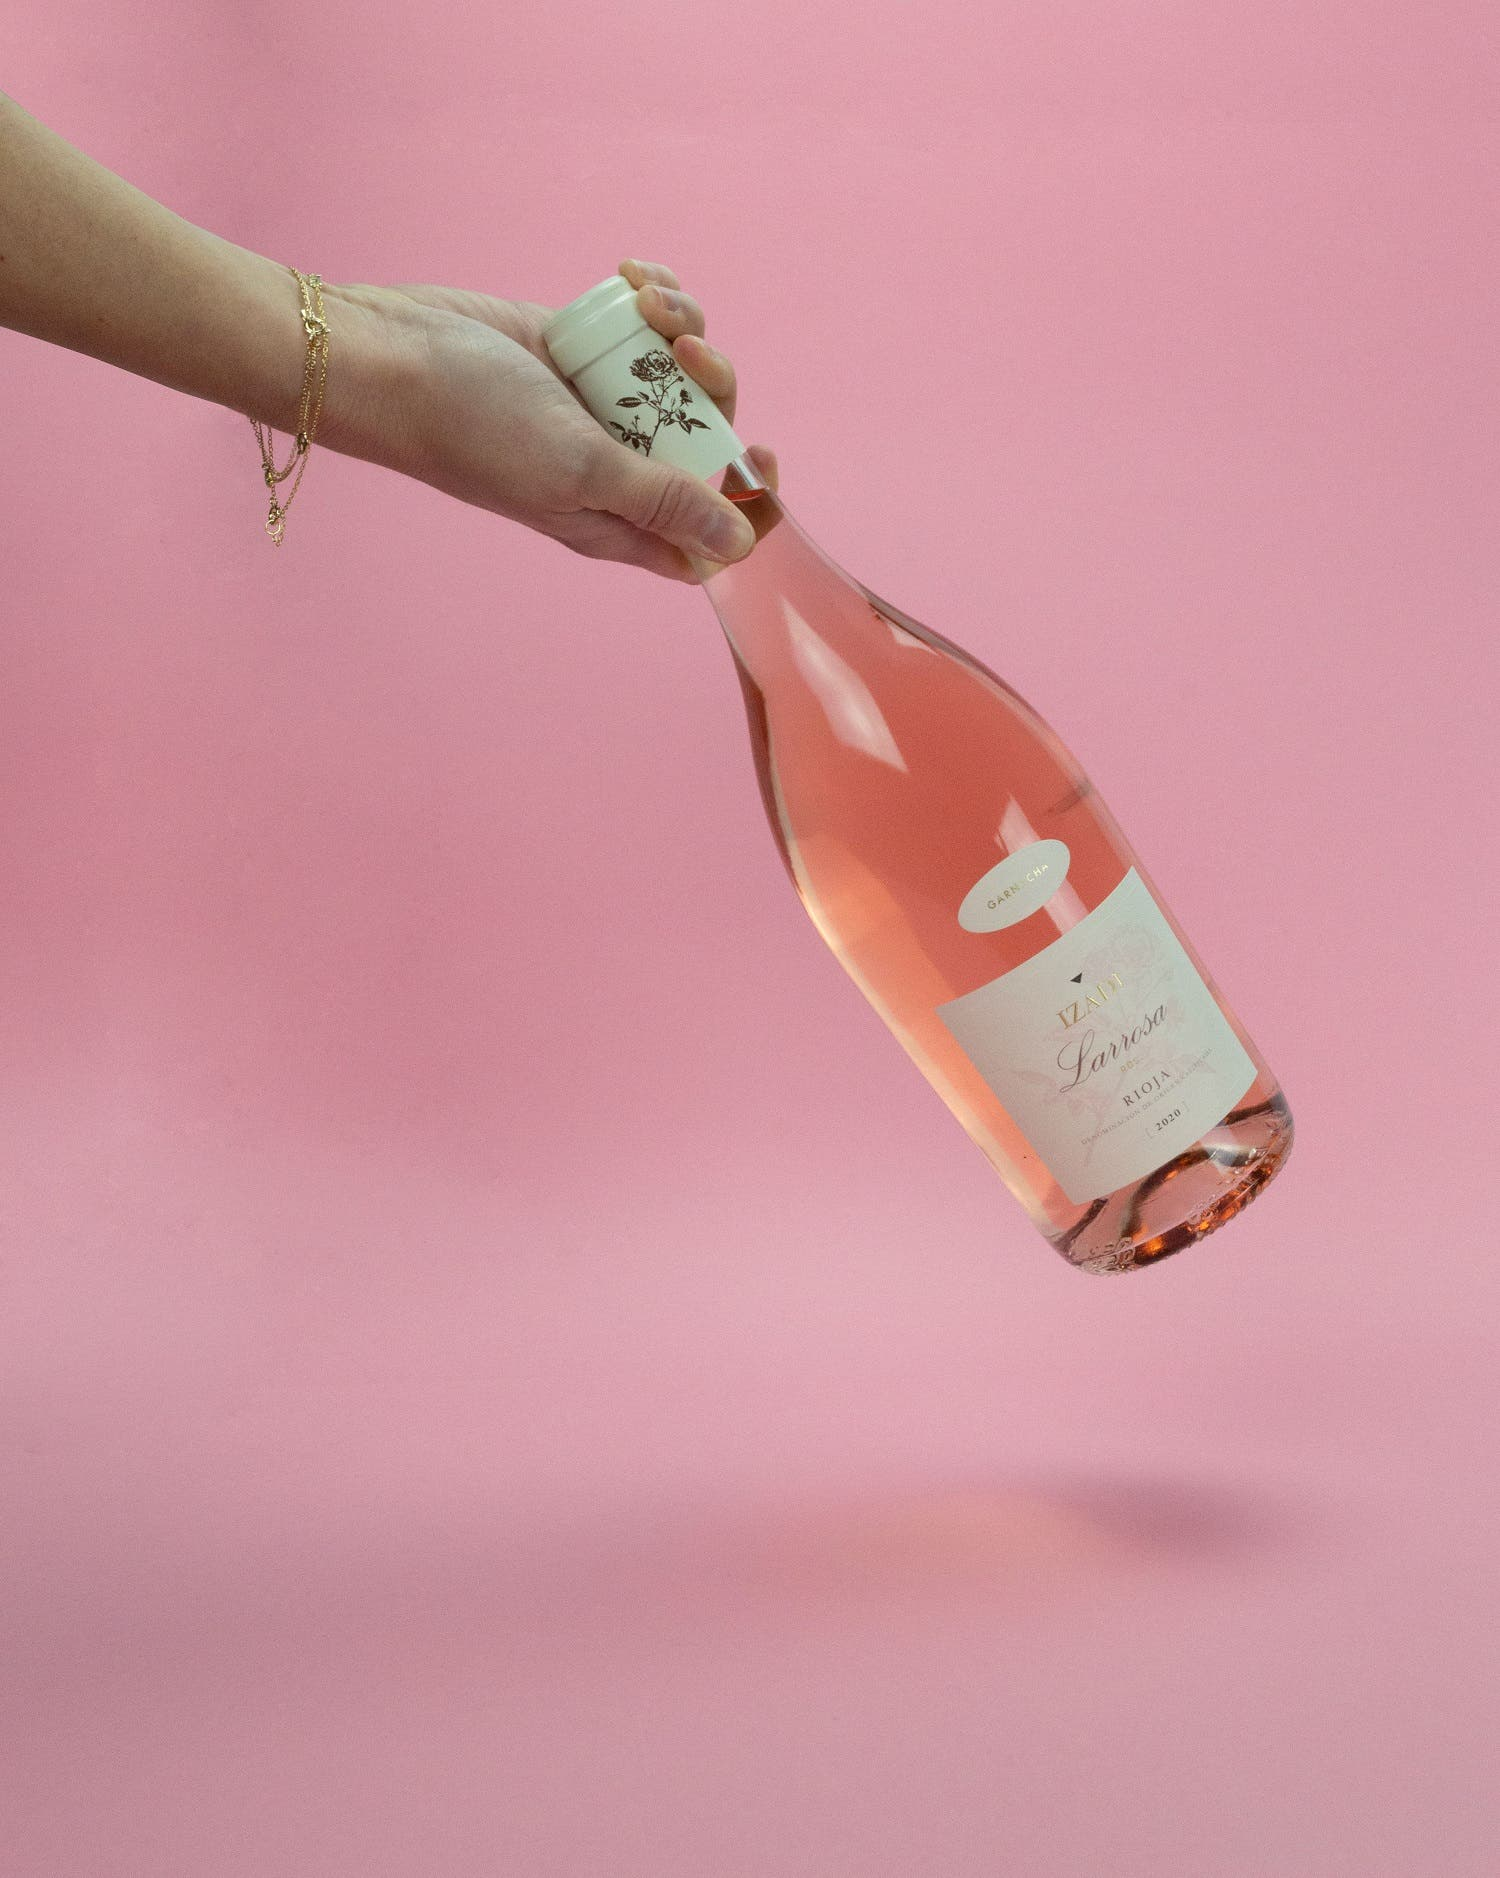 Larrosa Rosé revive San Valentín